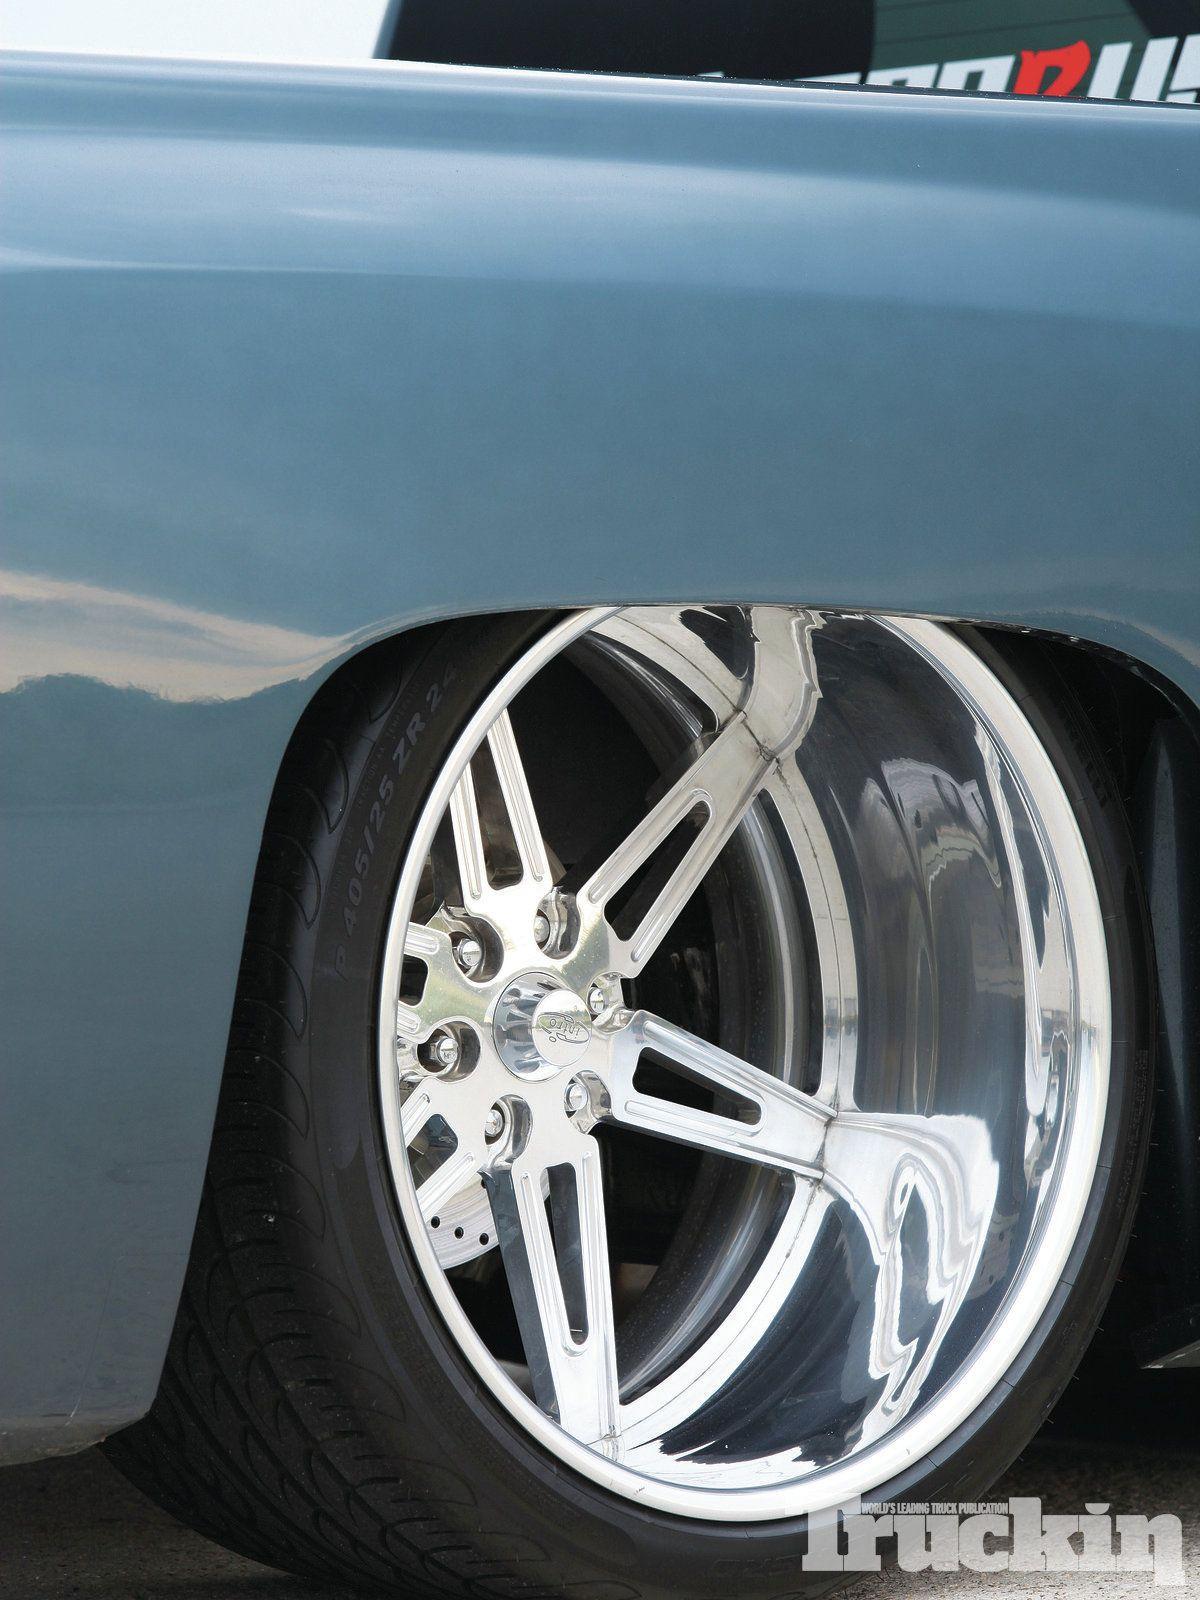 2007 chevy silverado intro torino wheels. billet split 5 6